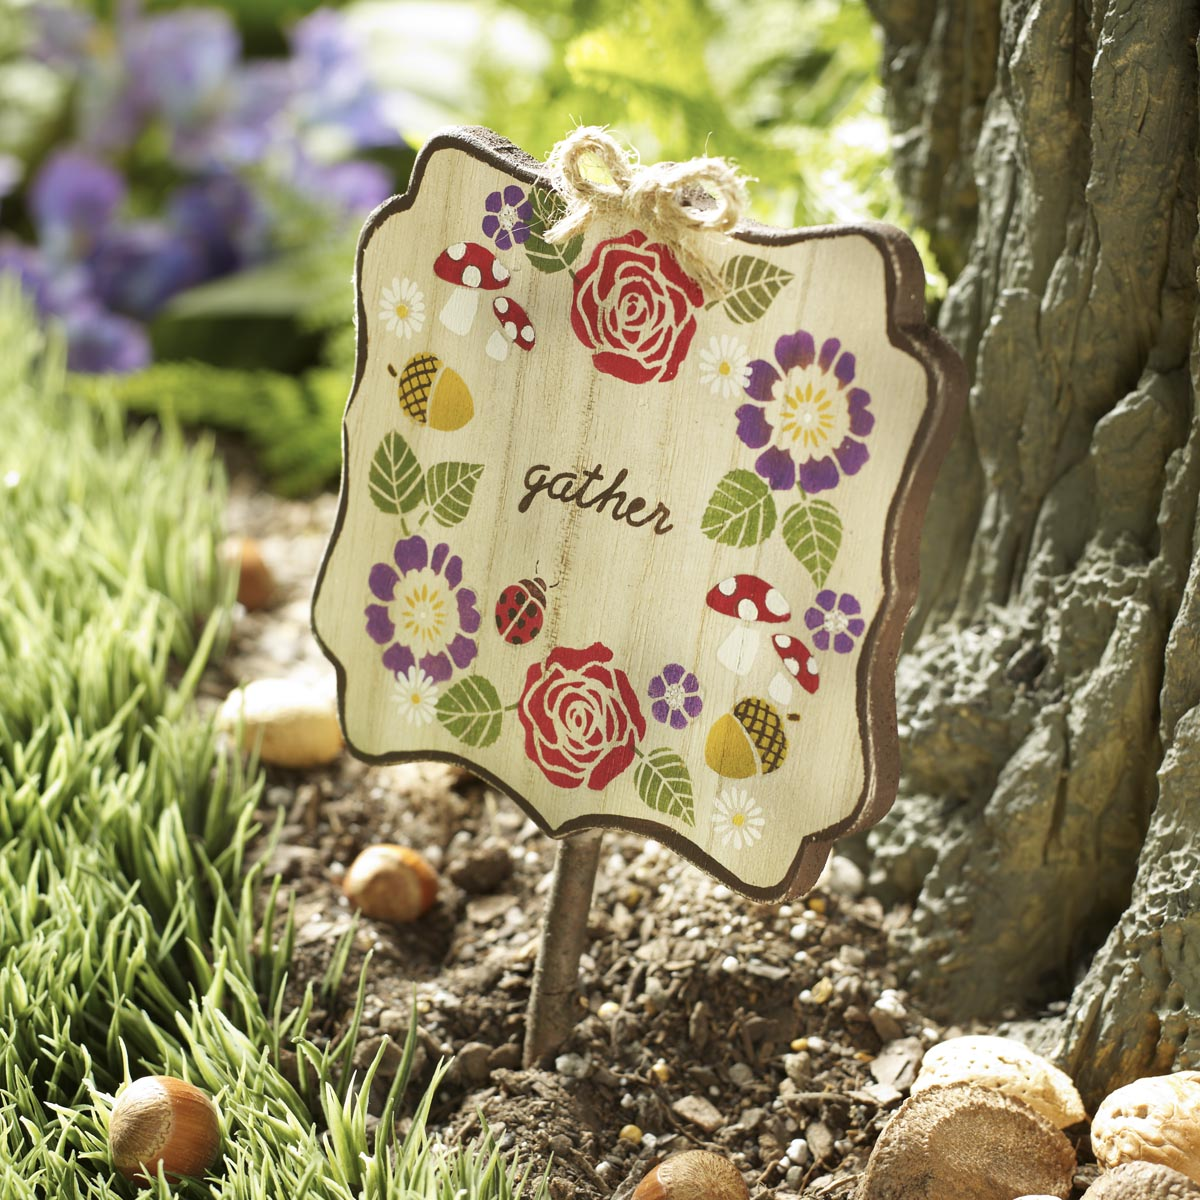 FolkArt ® Painting Stencils - Mini - Garden - 59794